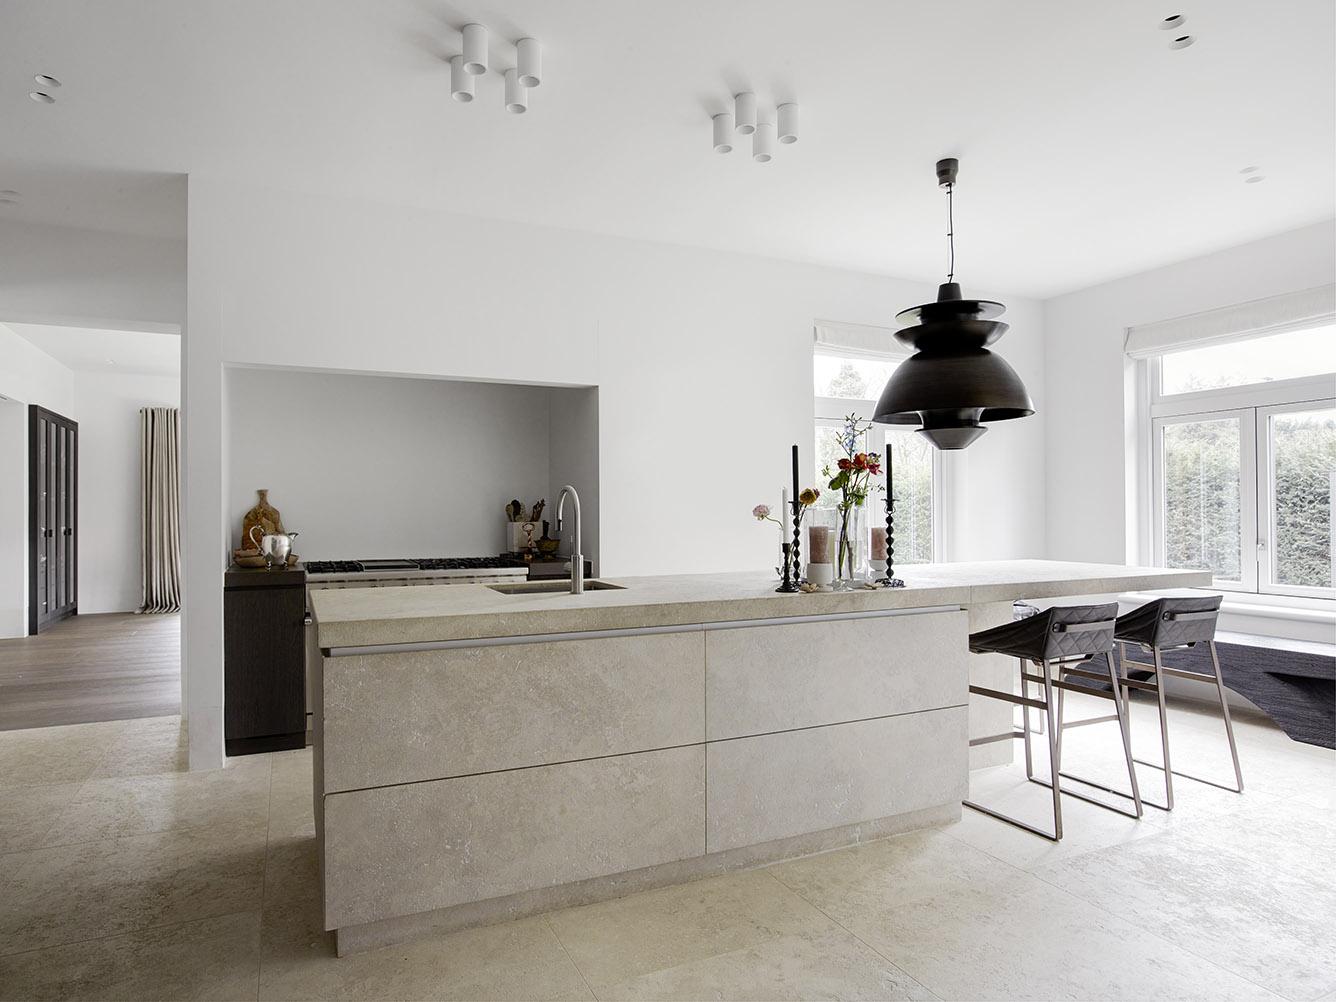 Urban residence in Amsterdam with KEKKE kitchen stool